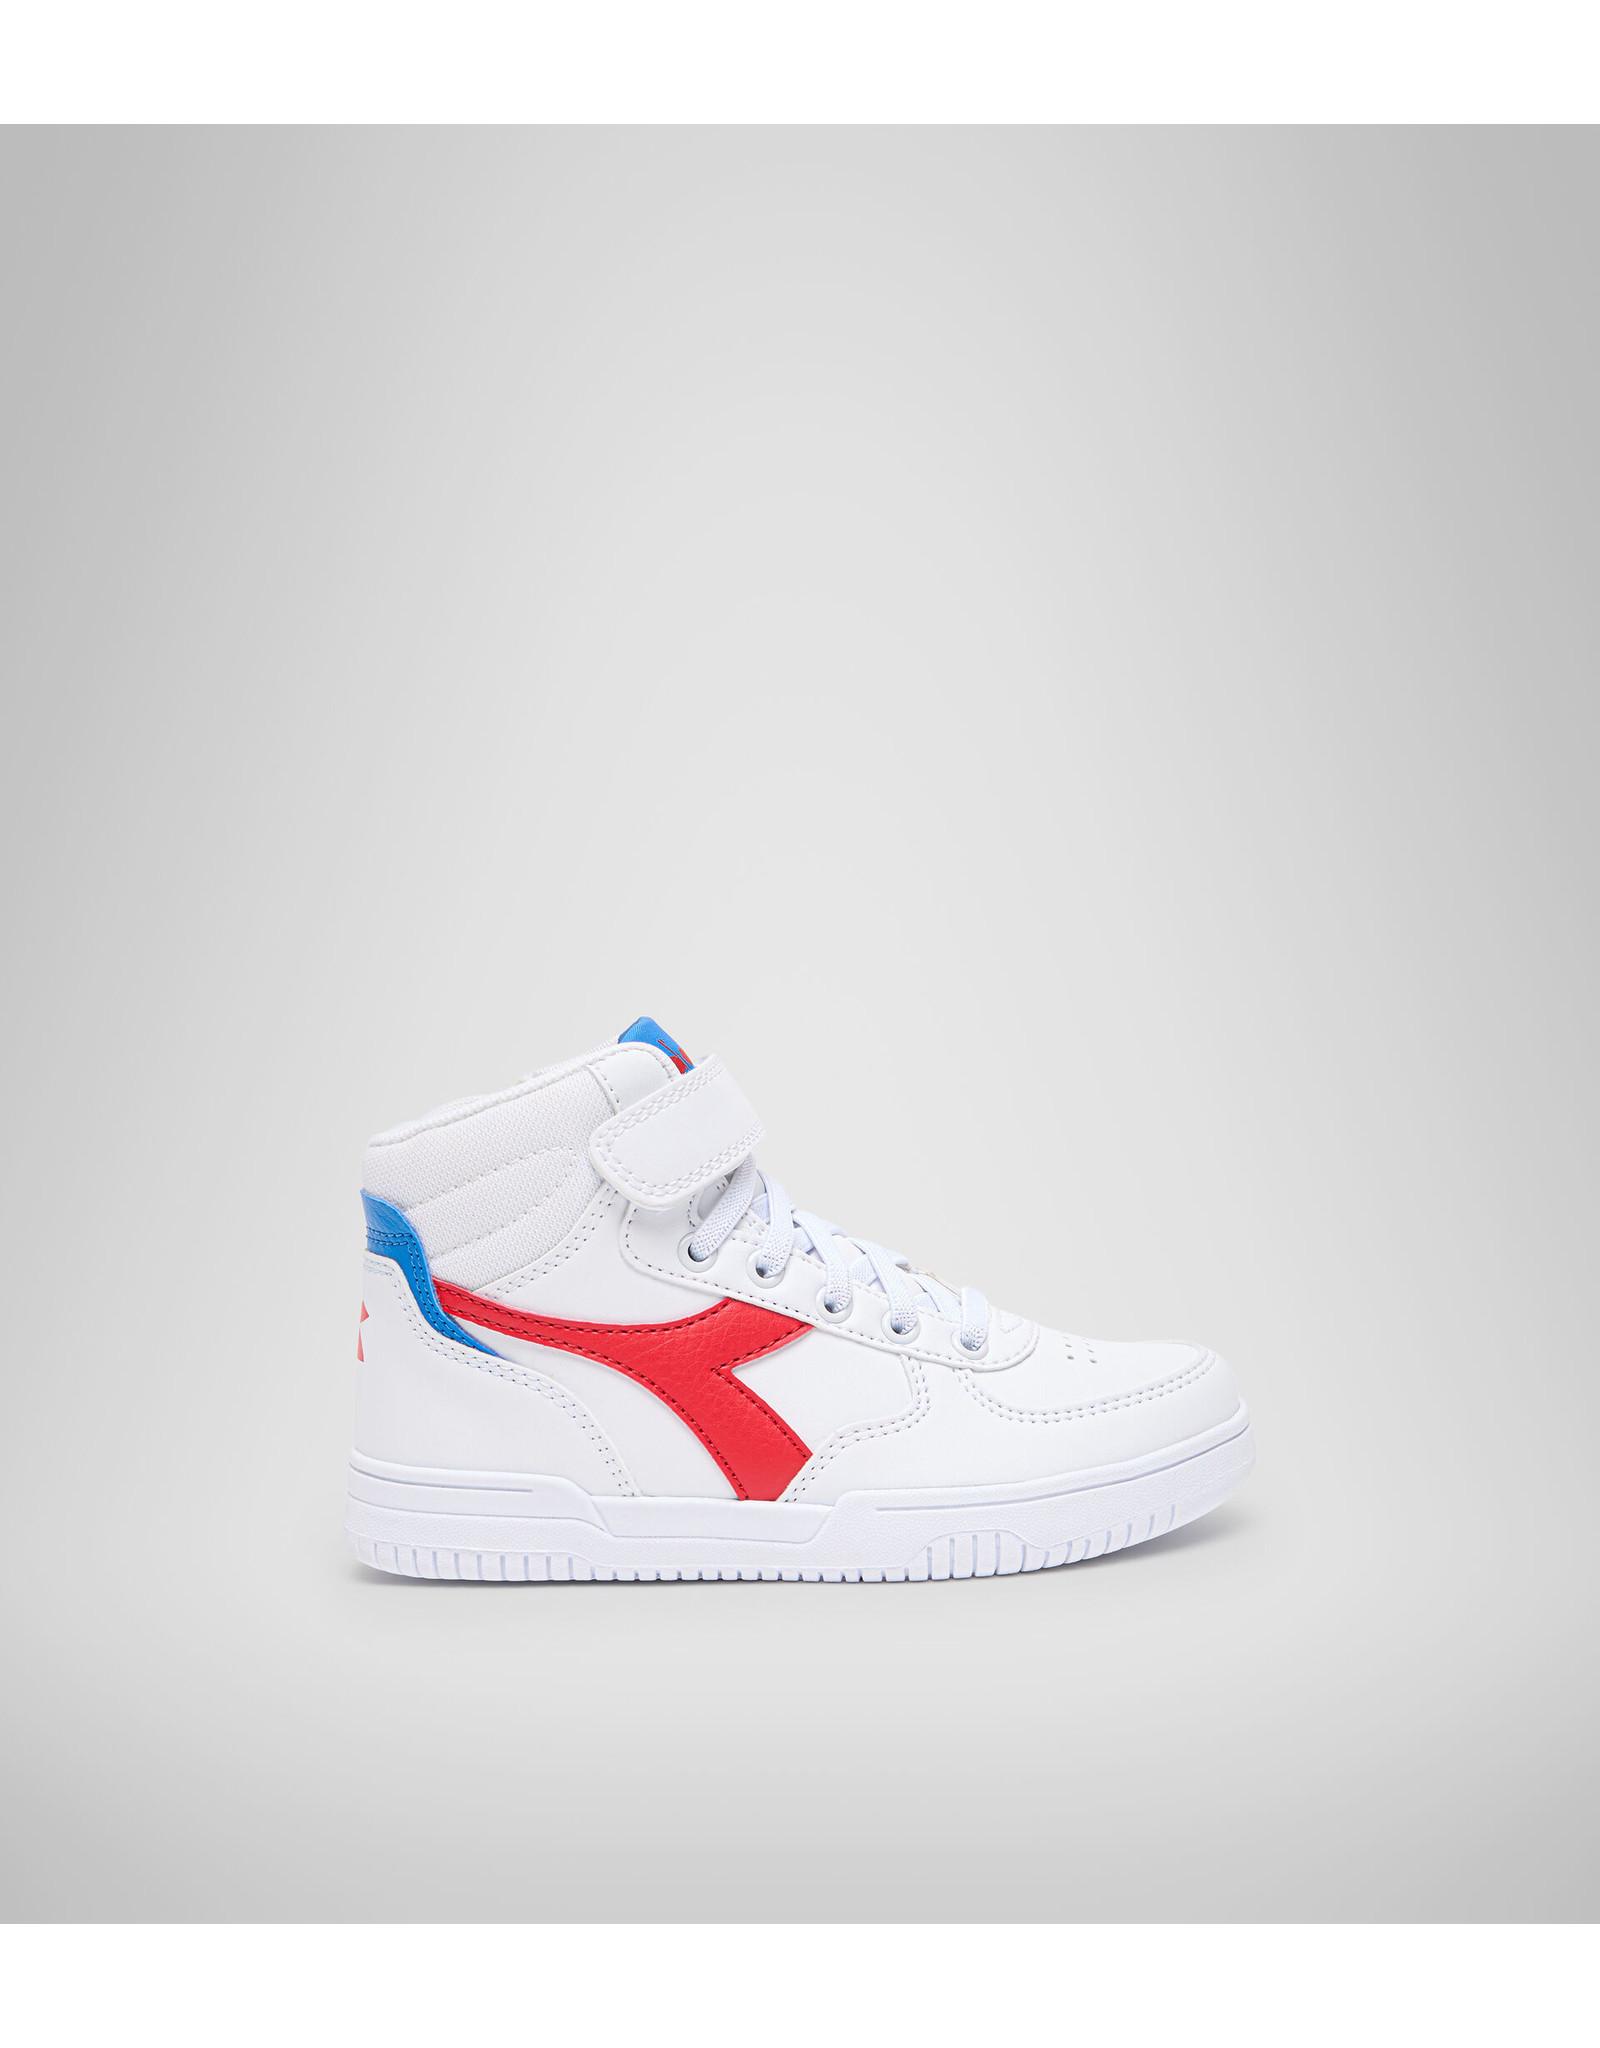 Diadora high top sneaker wit tomato rood